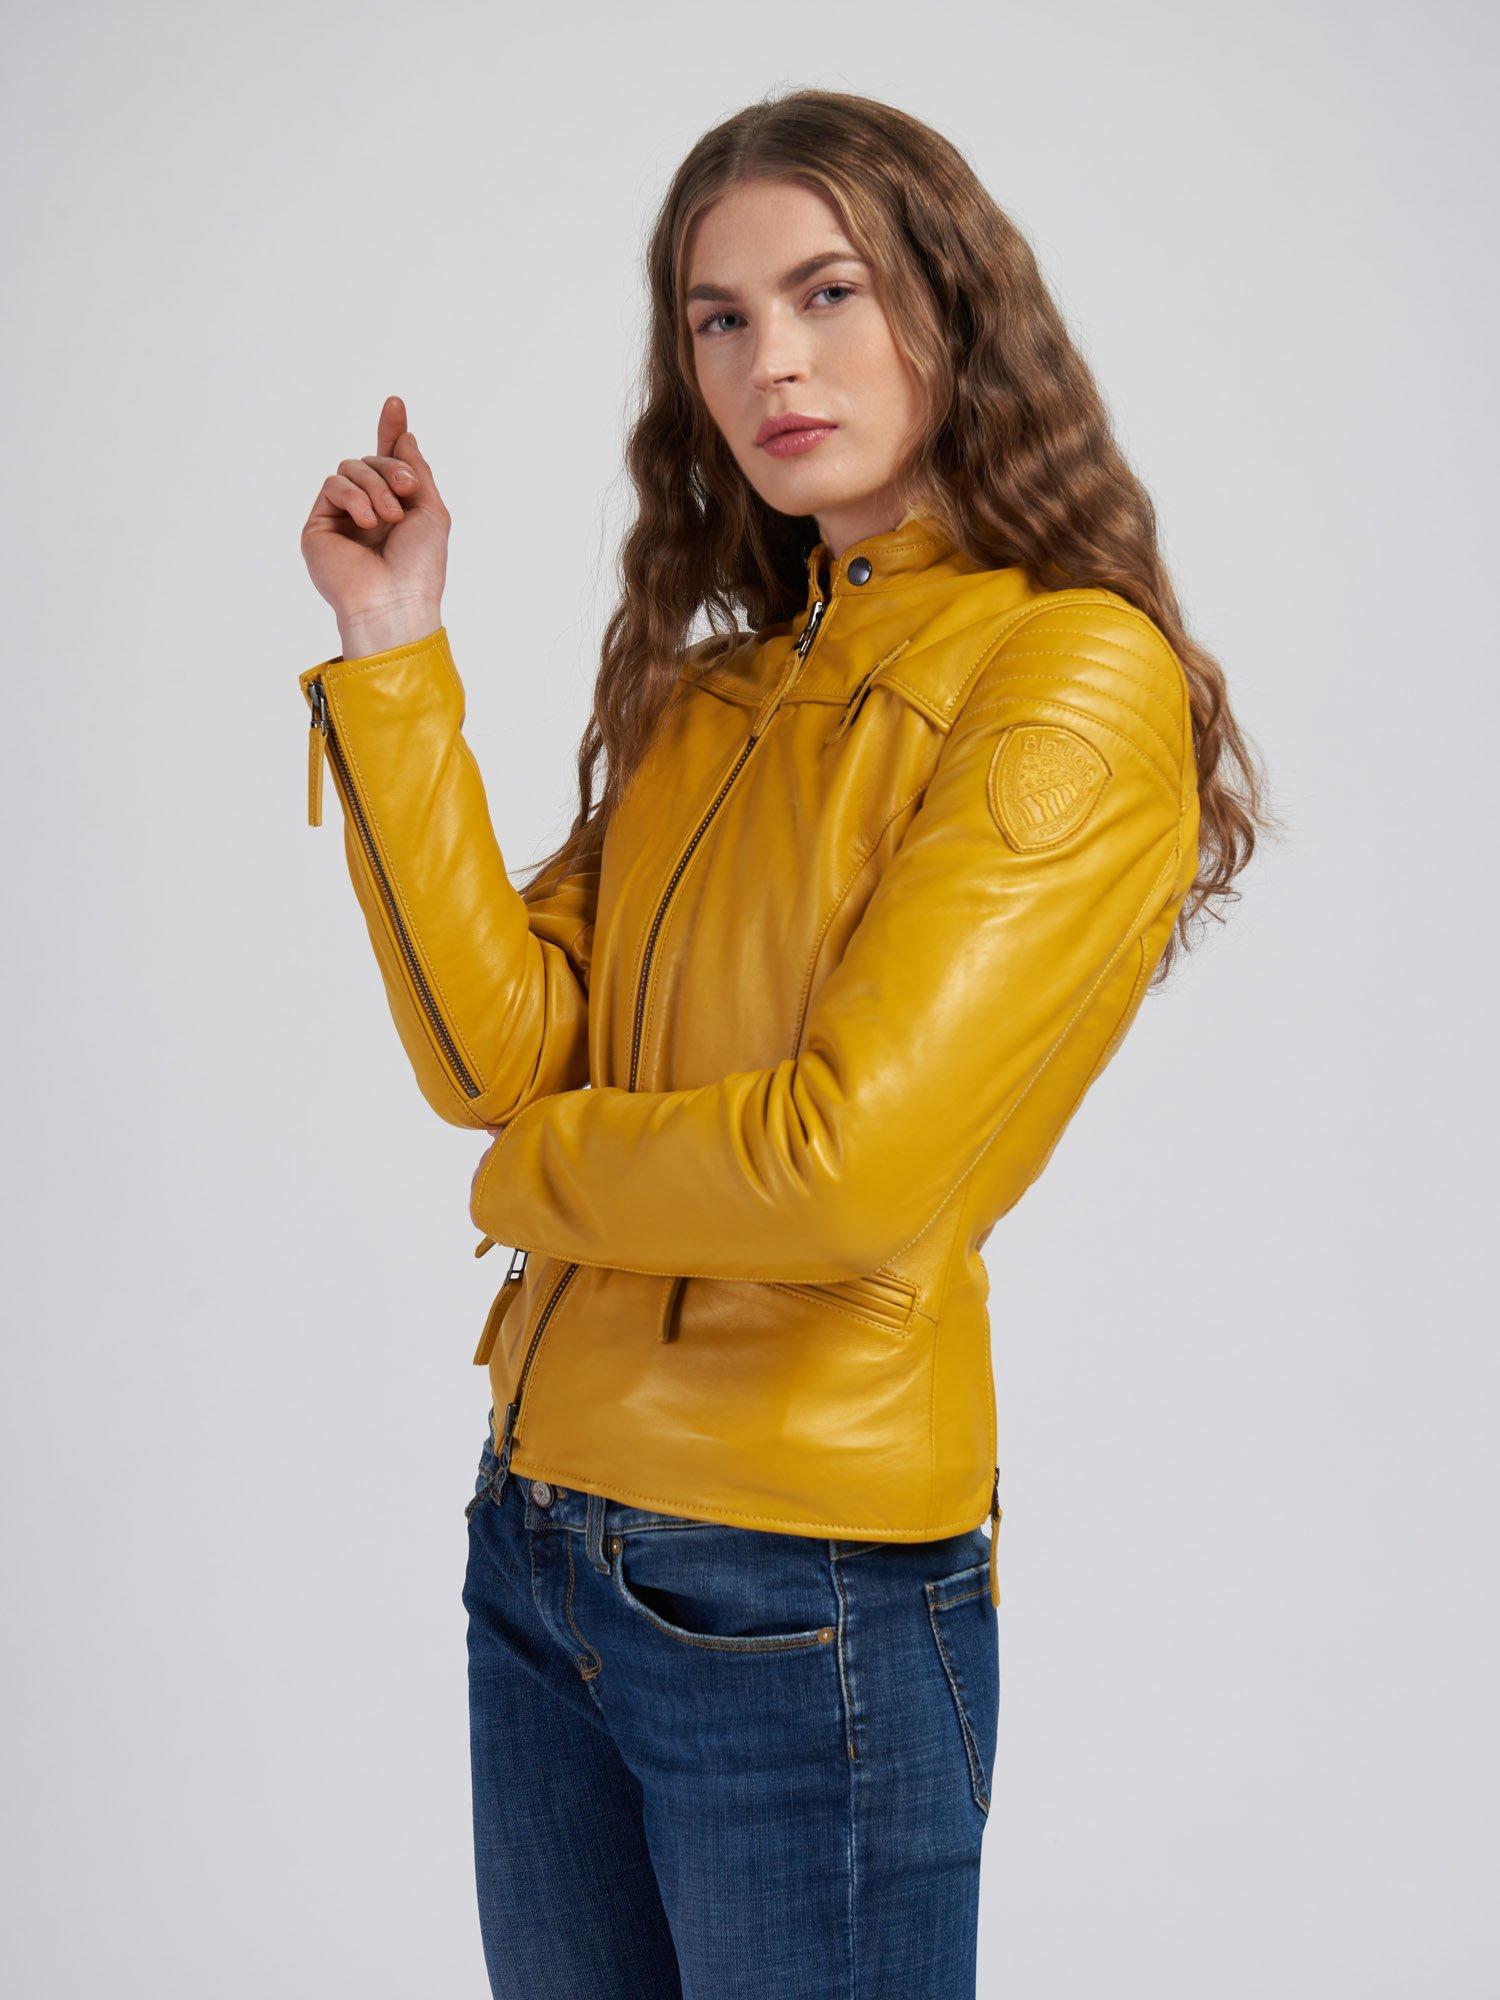 Blauer - LISA LEATHER JACKET - Yellow Vivid - Blauer